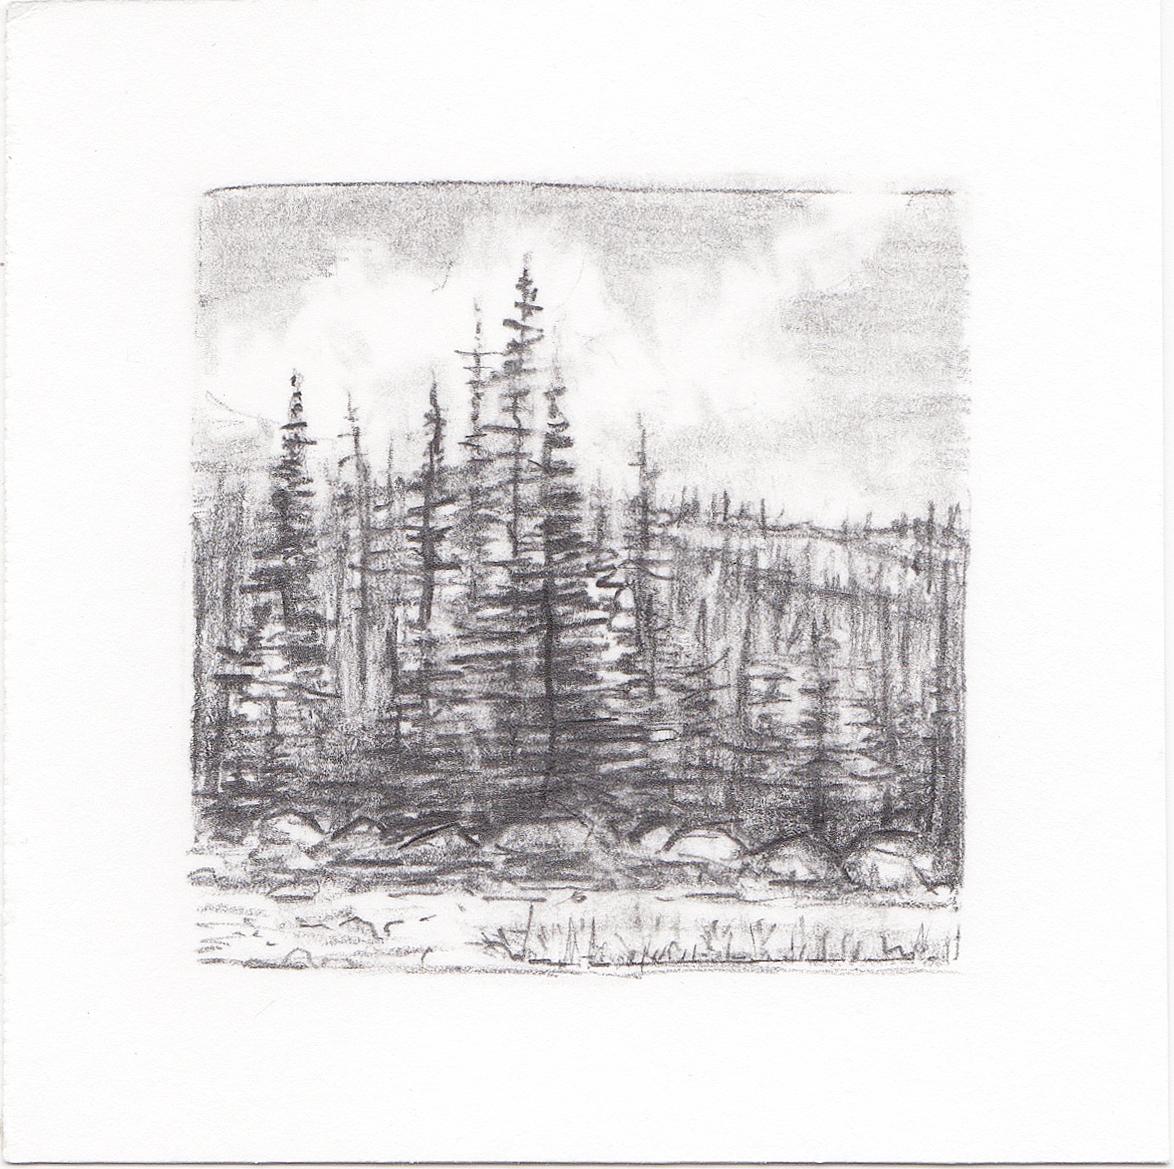 #43 Uinta Mountains, Utah | 3x3 | graphite